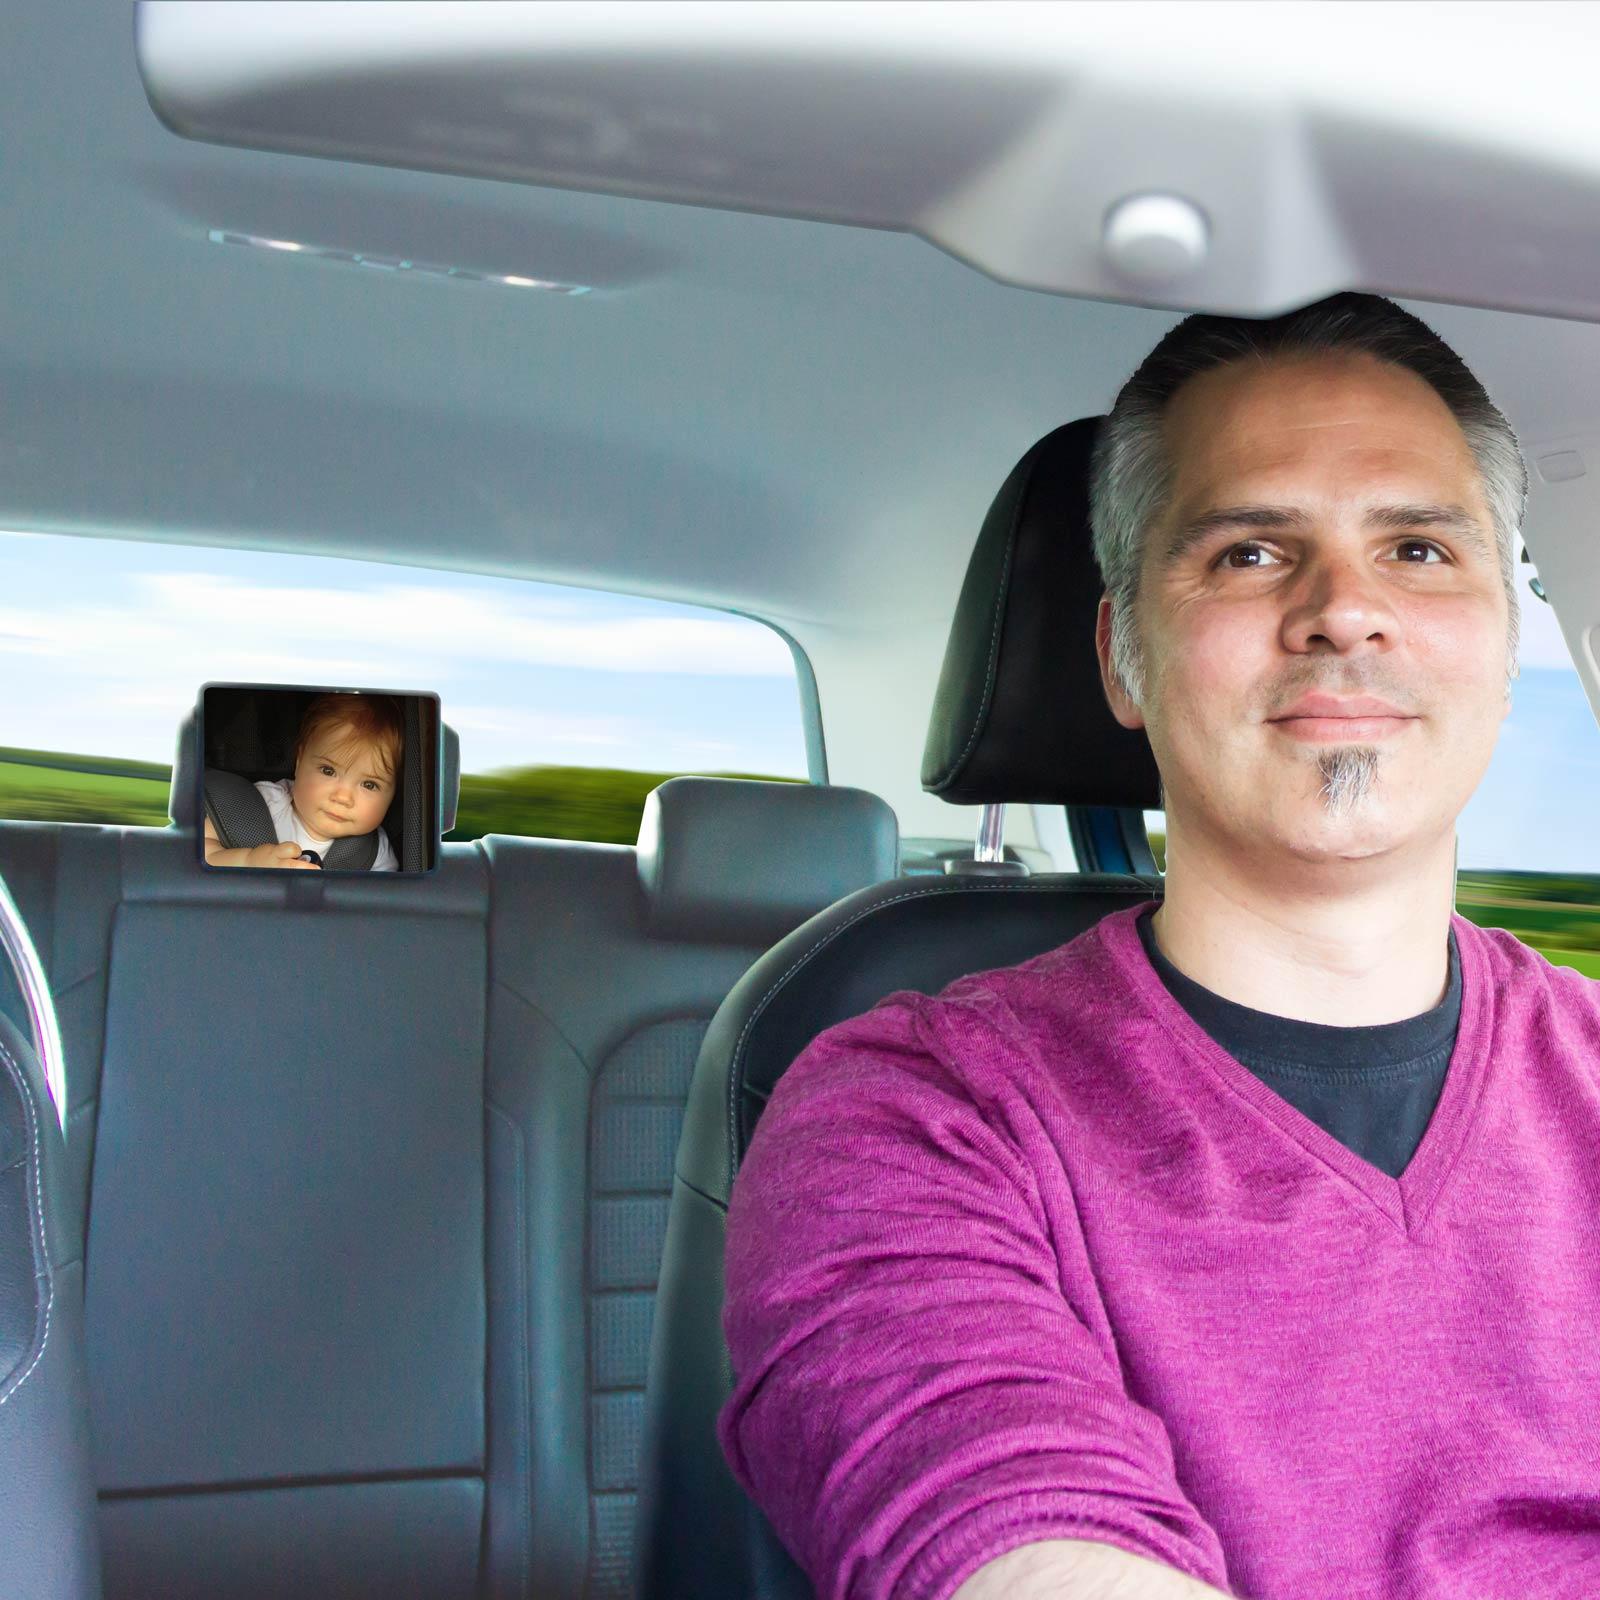 DIAGO - Car Safety Mirror Baby Car Seats & Reboard Seats